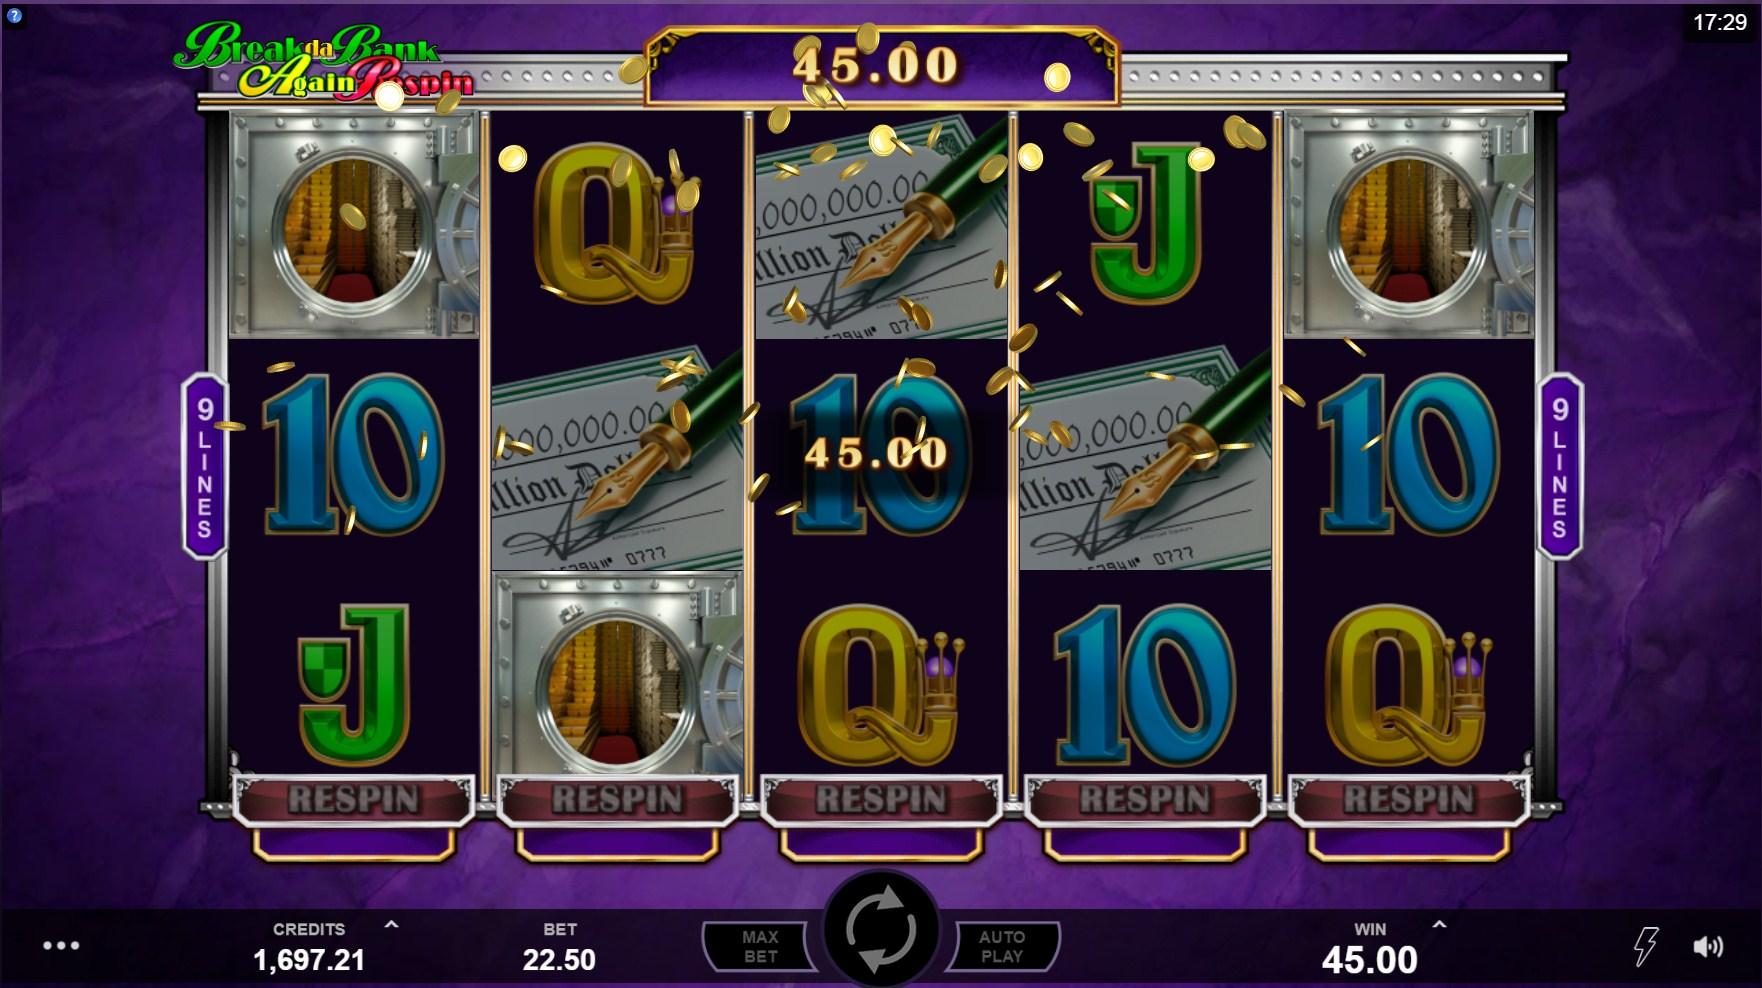 Break da Bank Again Respin Hyperspins Slot Gameplay